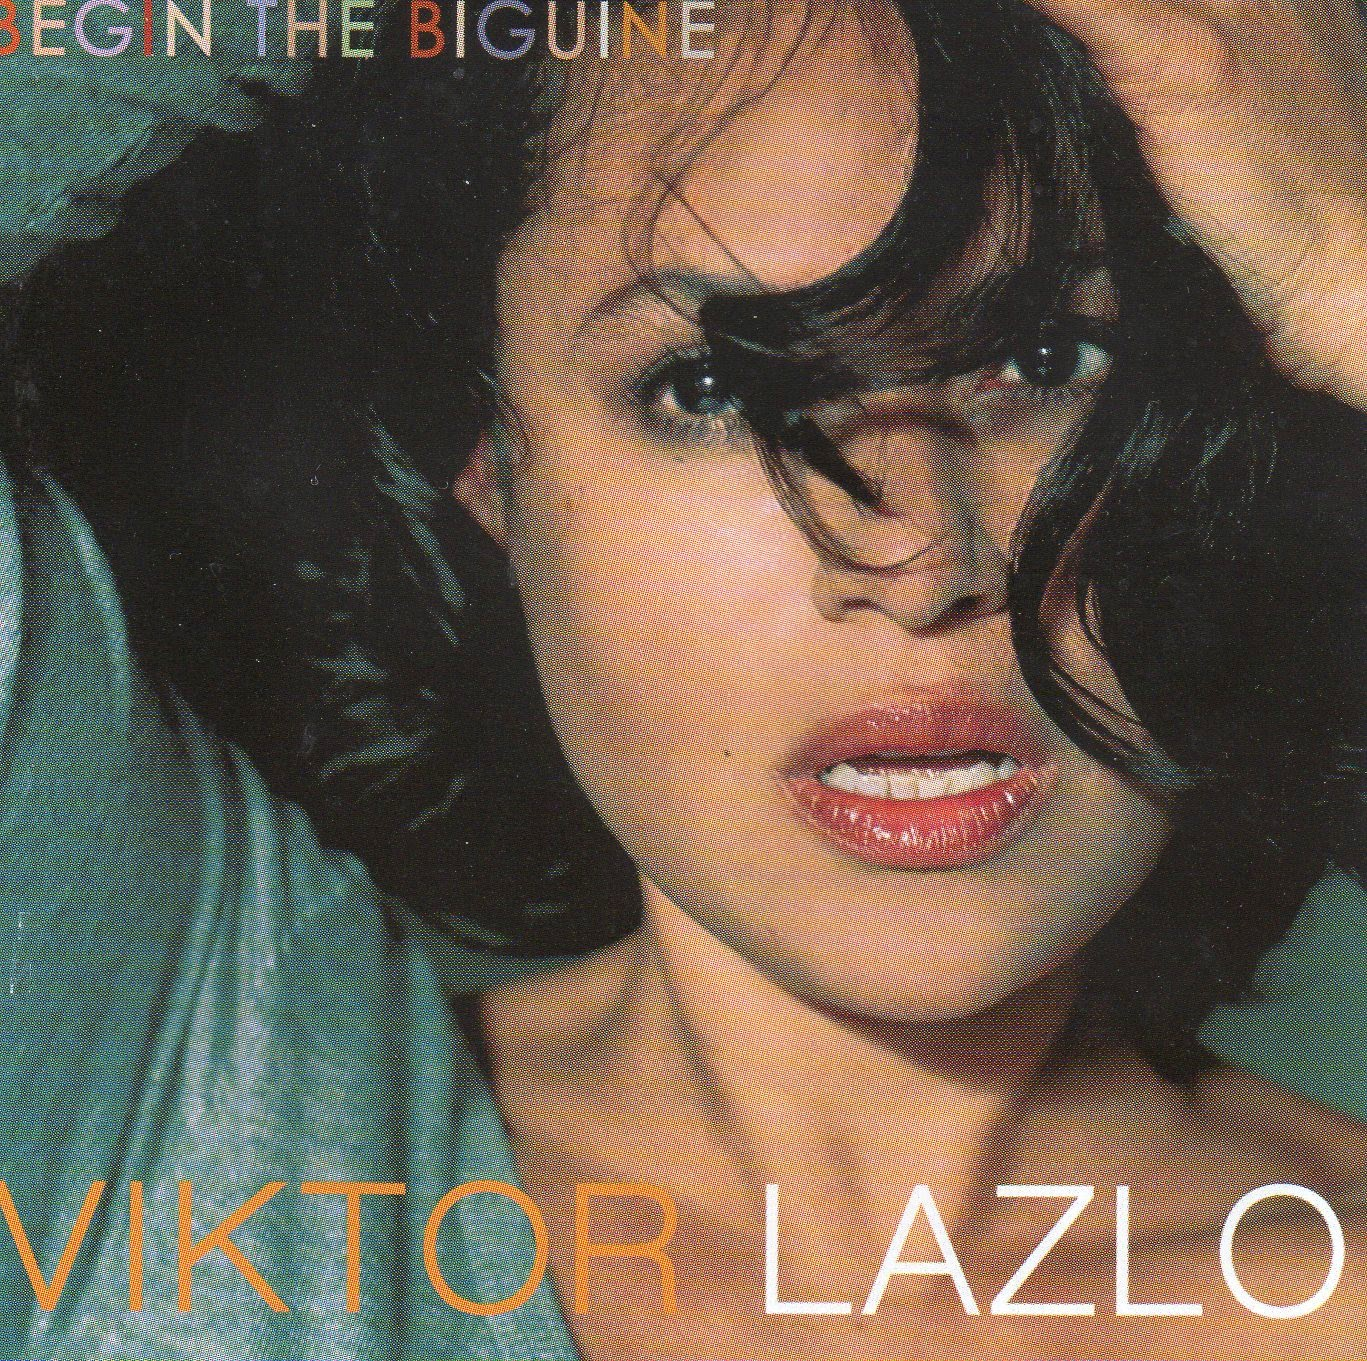 Viktor Lazlo - My Delicious Poison